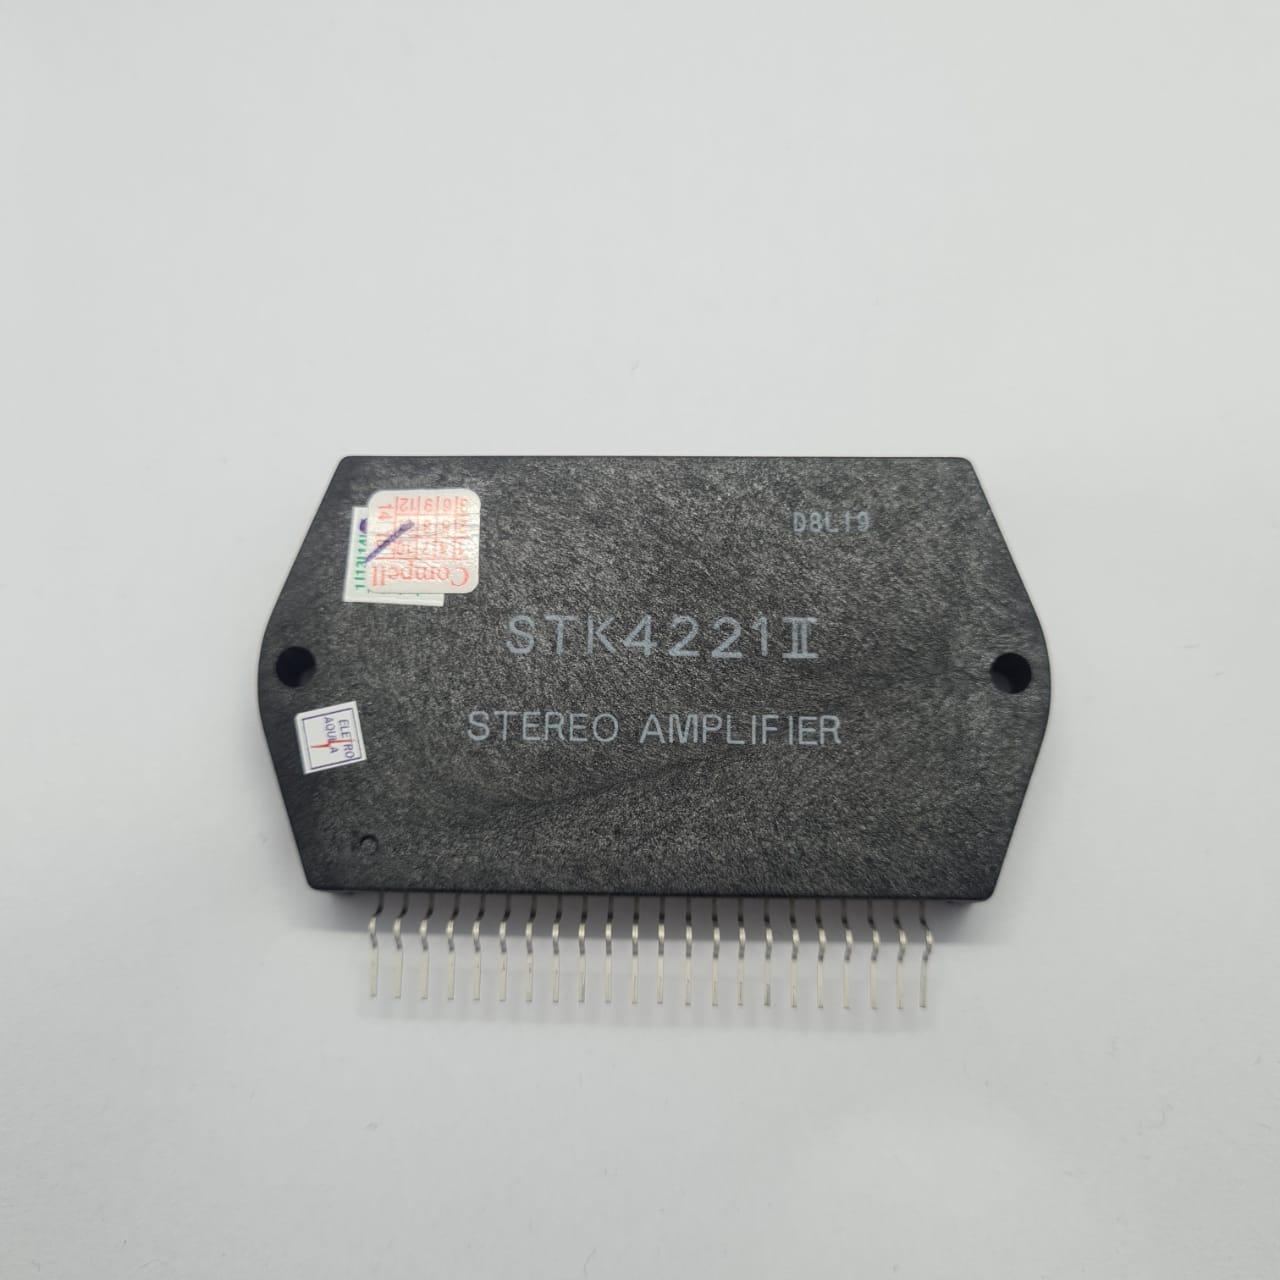 Circuito Integrado STK4221 II  CI 90